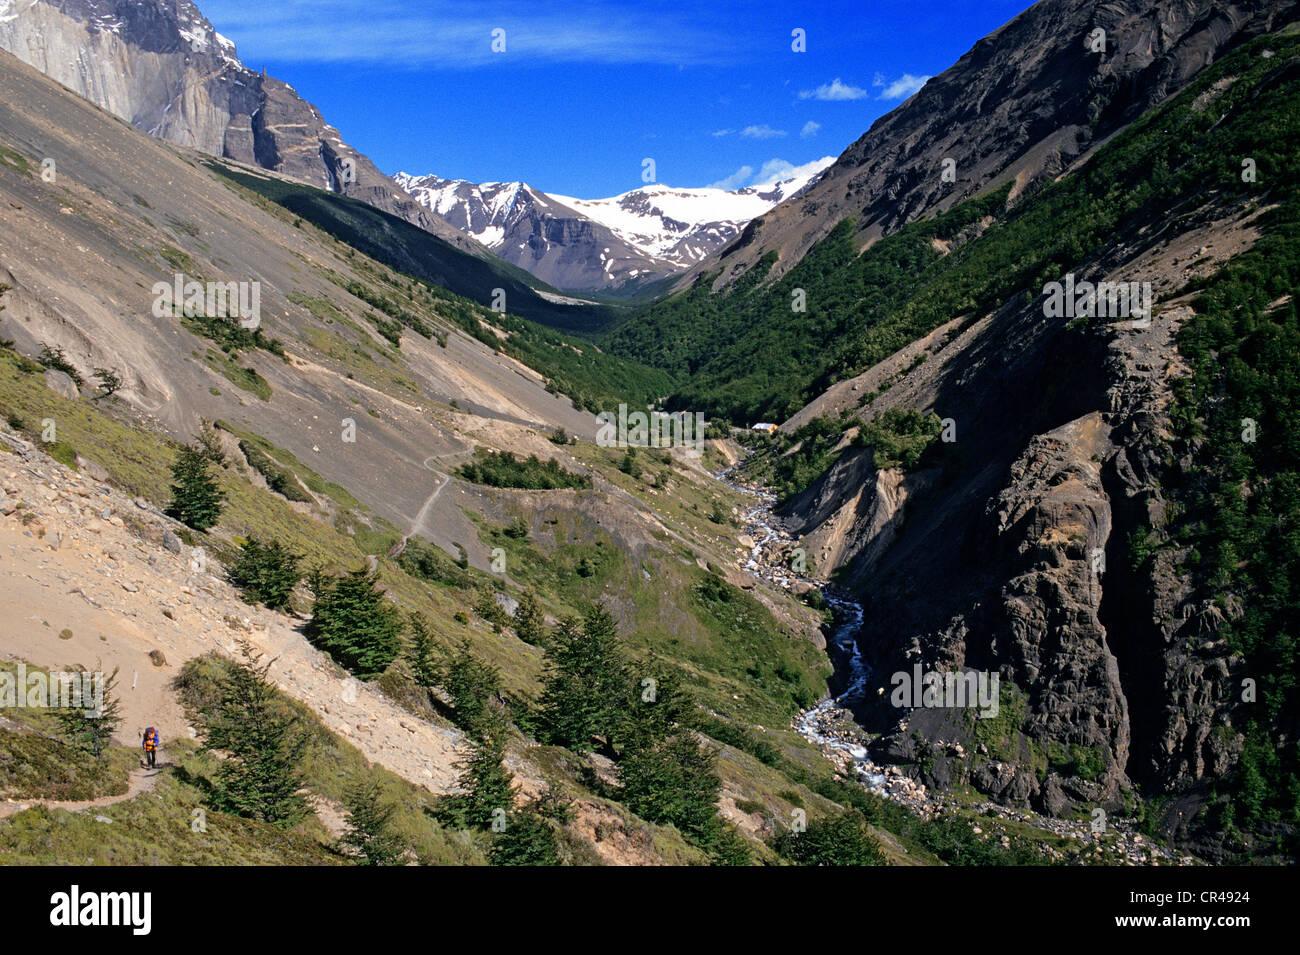 Chile, Magallanes and Antartica Chilena Region, Ultima Esperanza Province, Torres del paine National Park, trekking - Stock Image